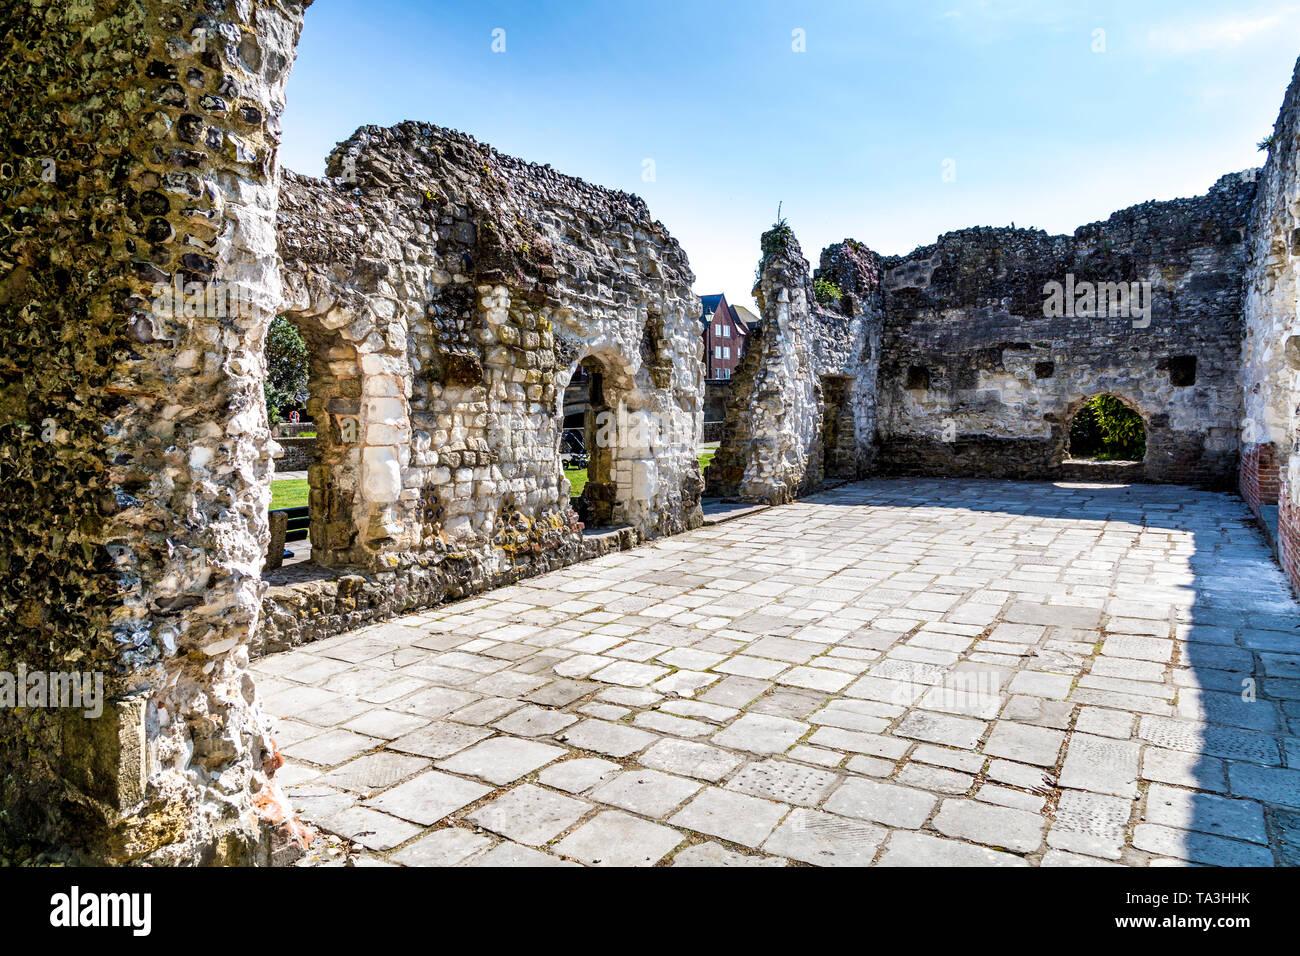 Blackfriars Dominican Priory Ruin next to the River Arun, Arundel, UK - Stock Image